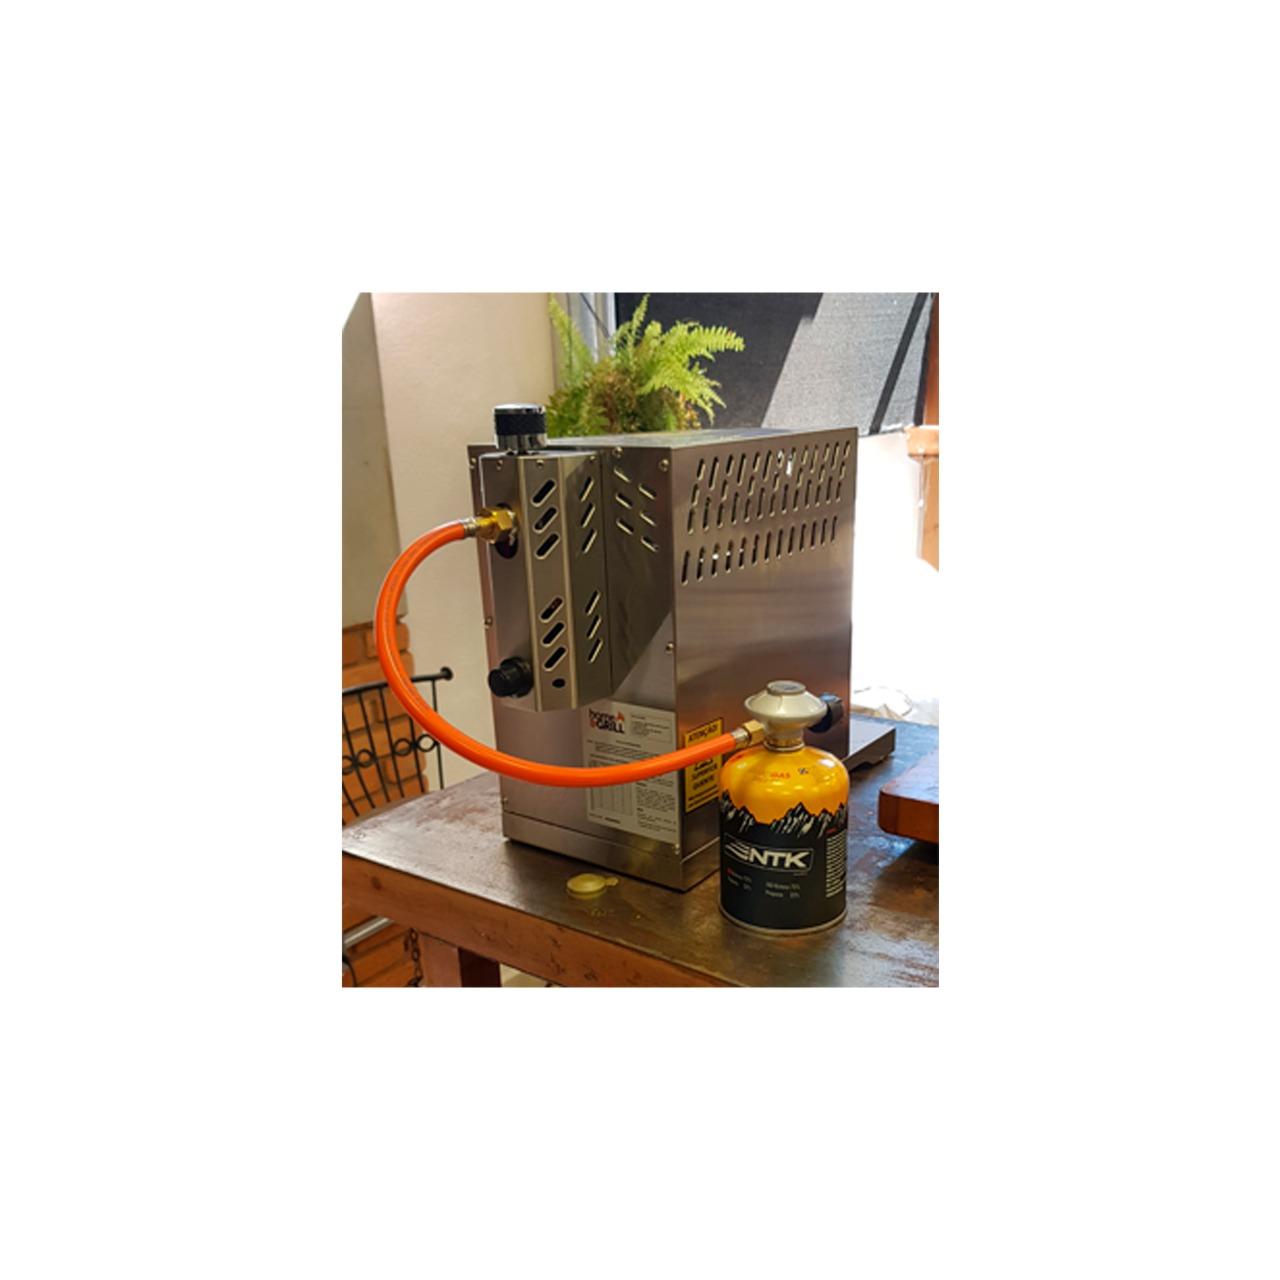 Churrasqueira Portátil Home&Grill Maxx  - Sua Casa Gourmet e Cia